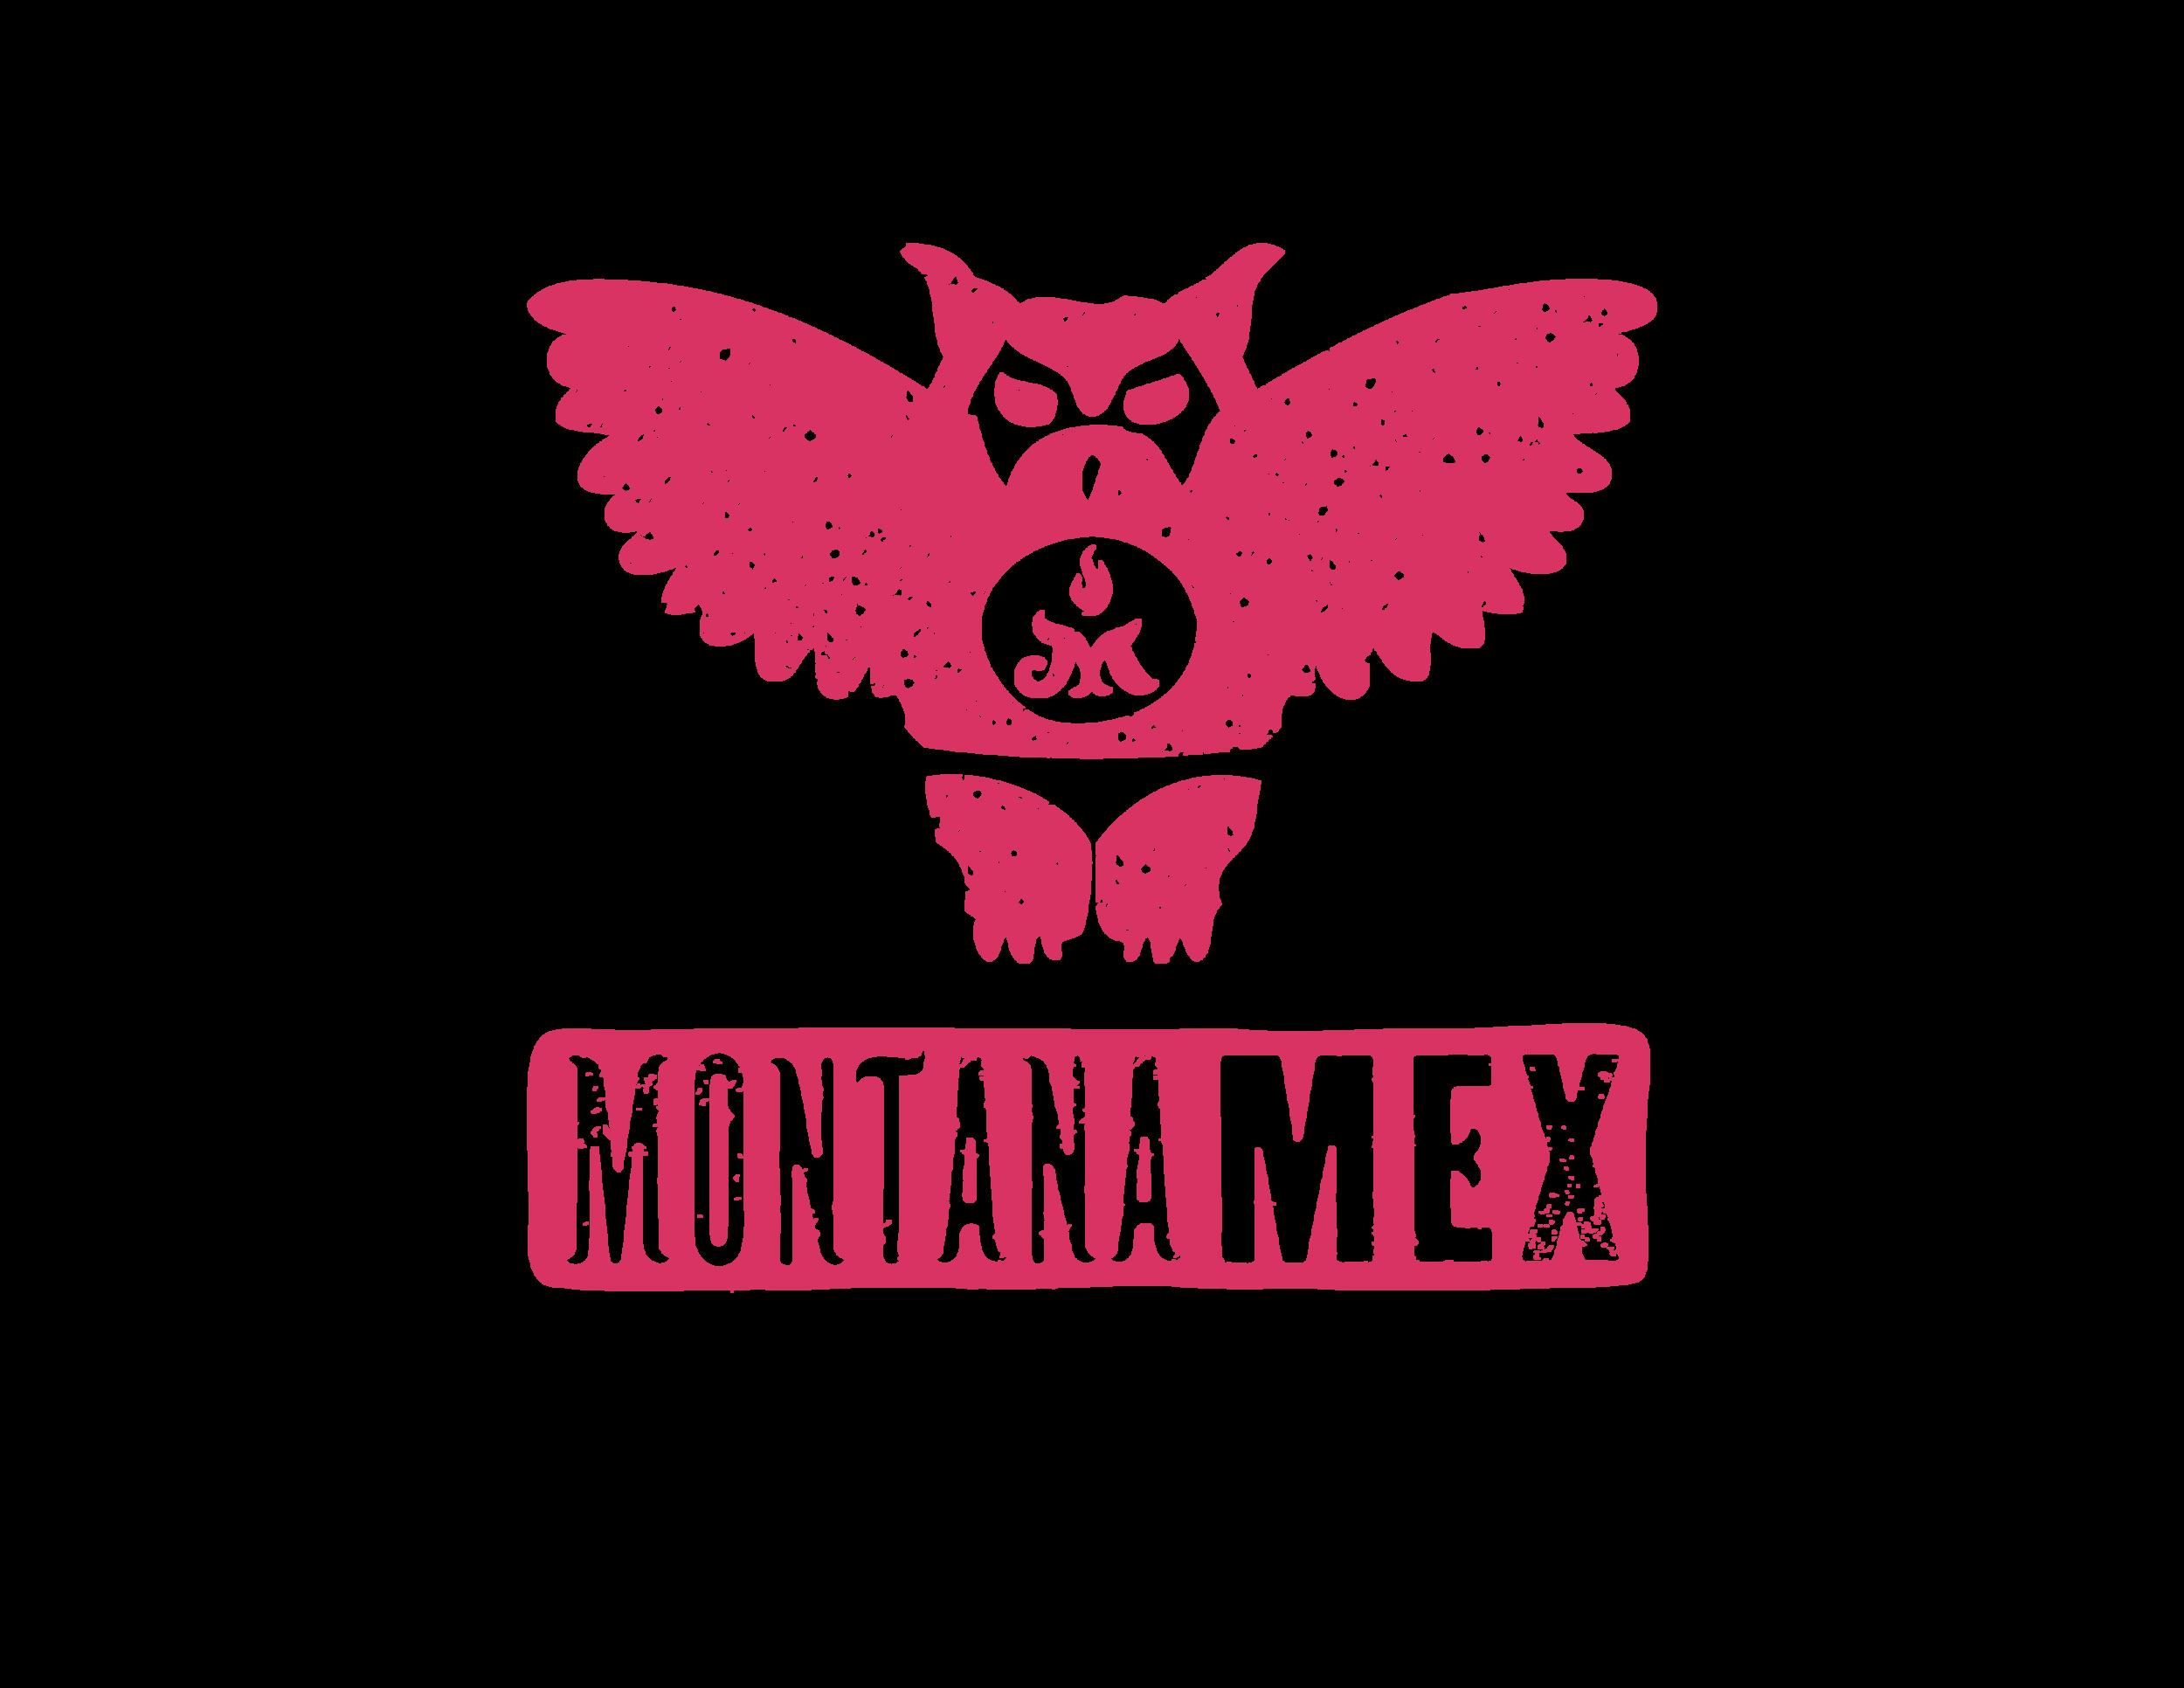 Montana Mex